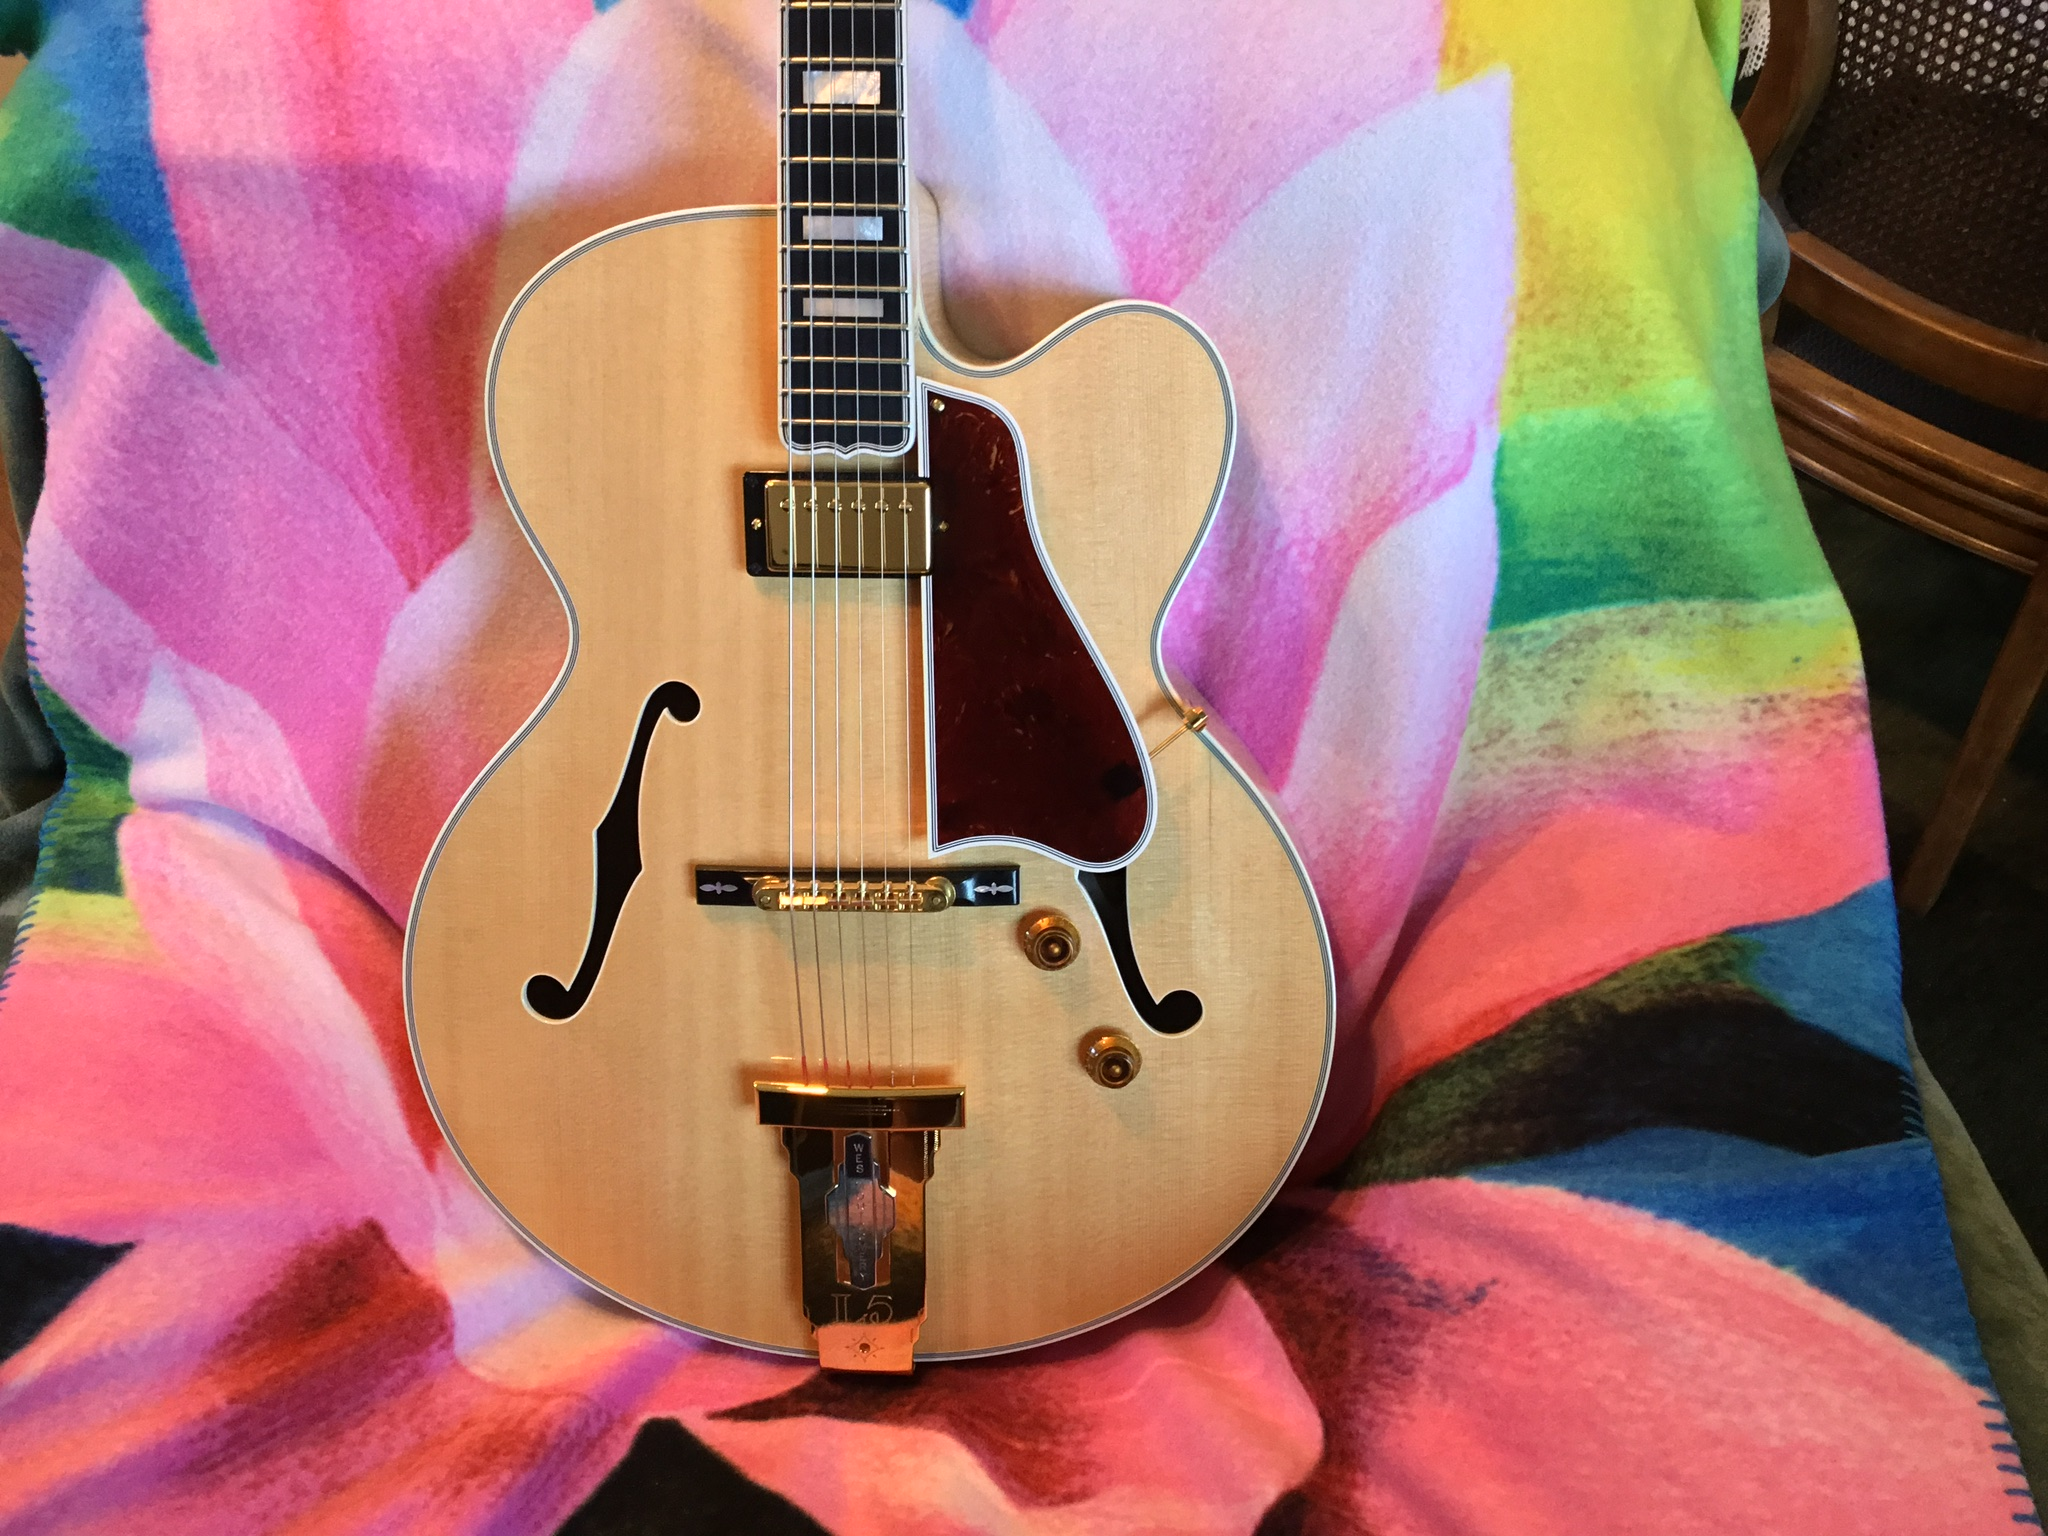 RIP Gibson Archtop guitar-73277fc8-2df8-4c33-965d-bcfdfdd61385-jpeg